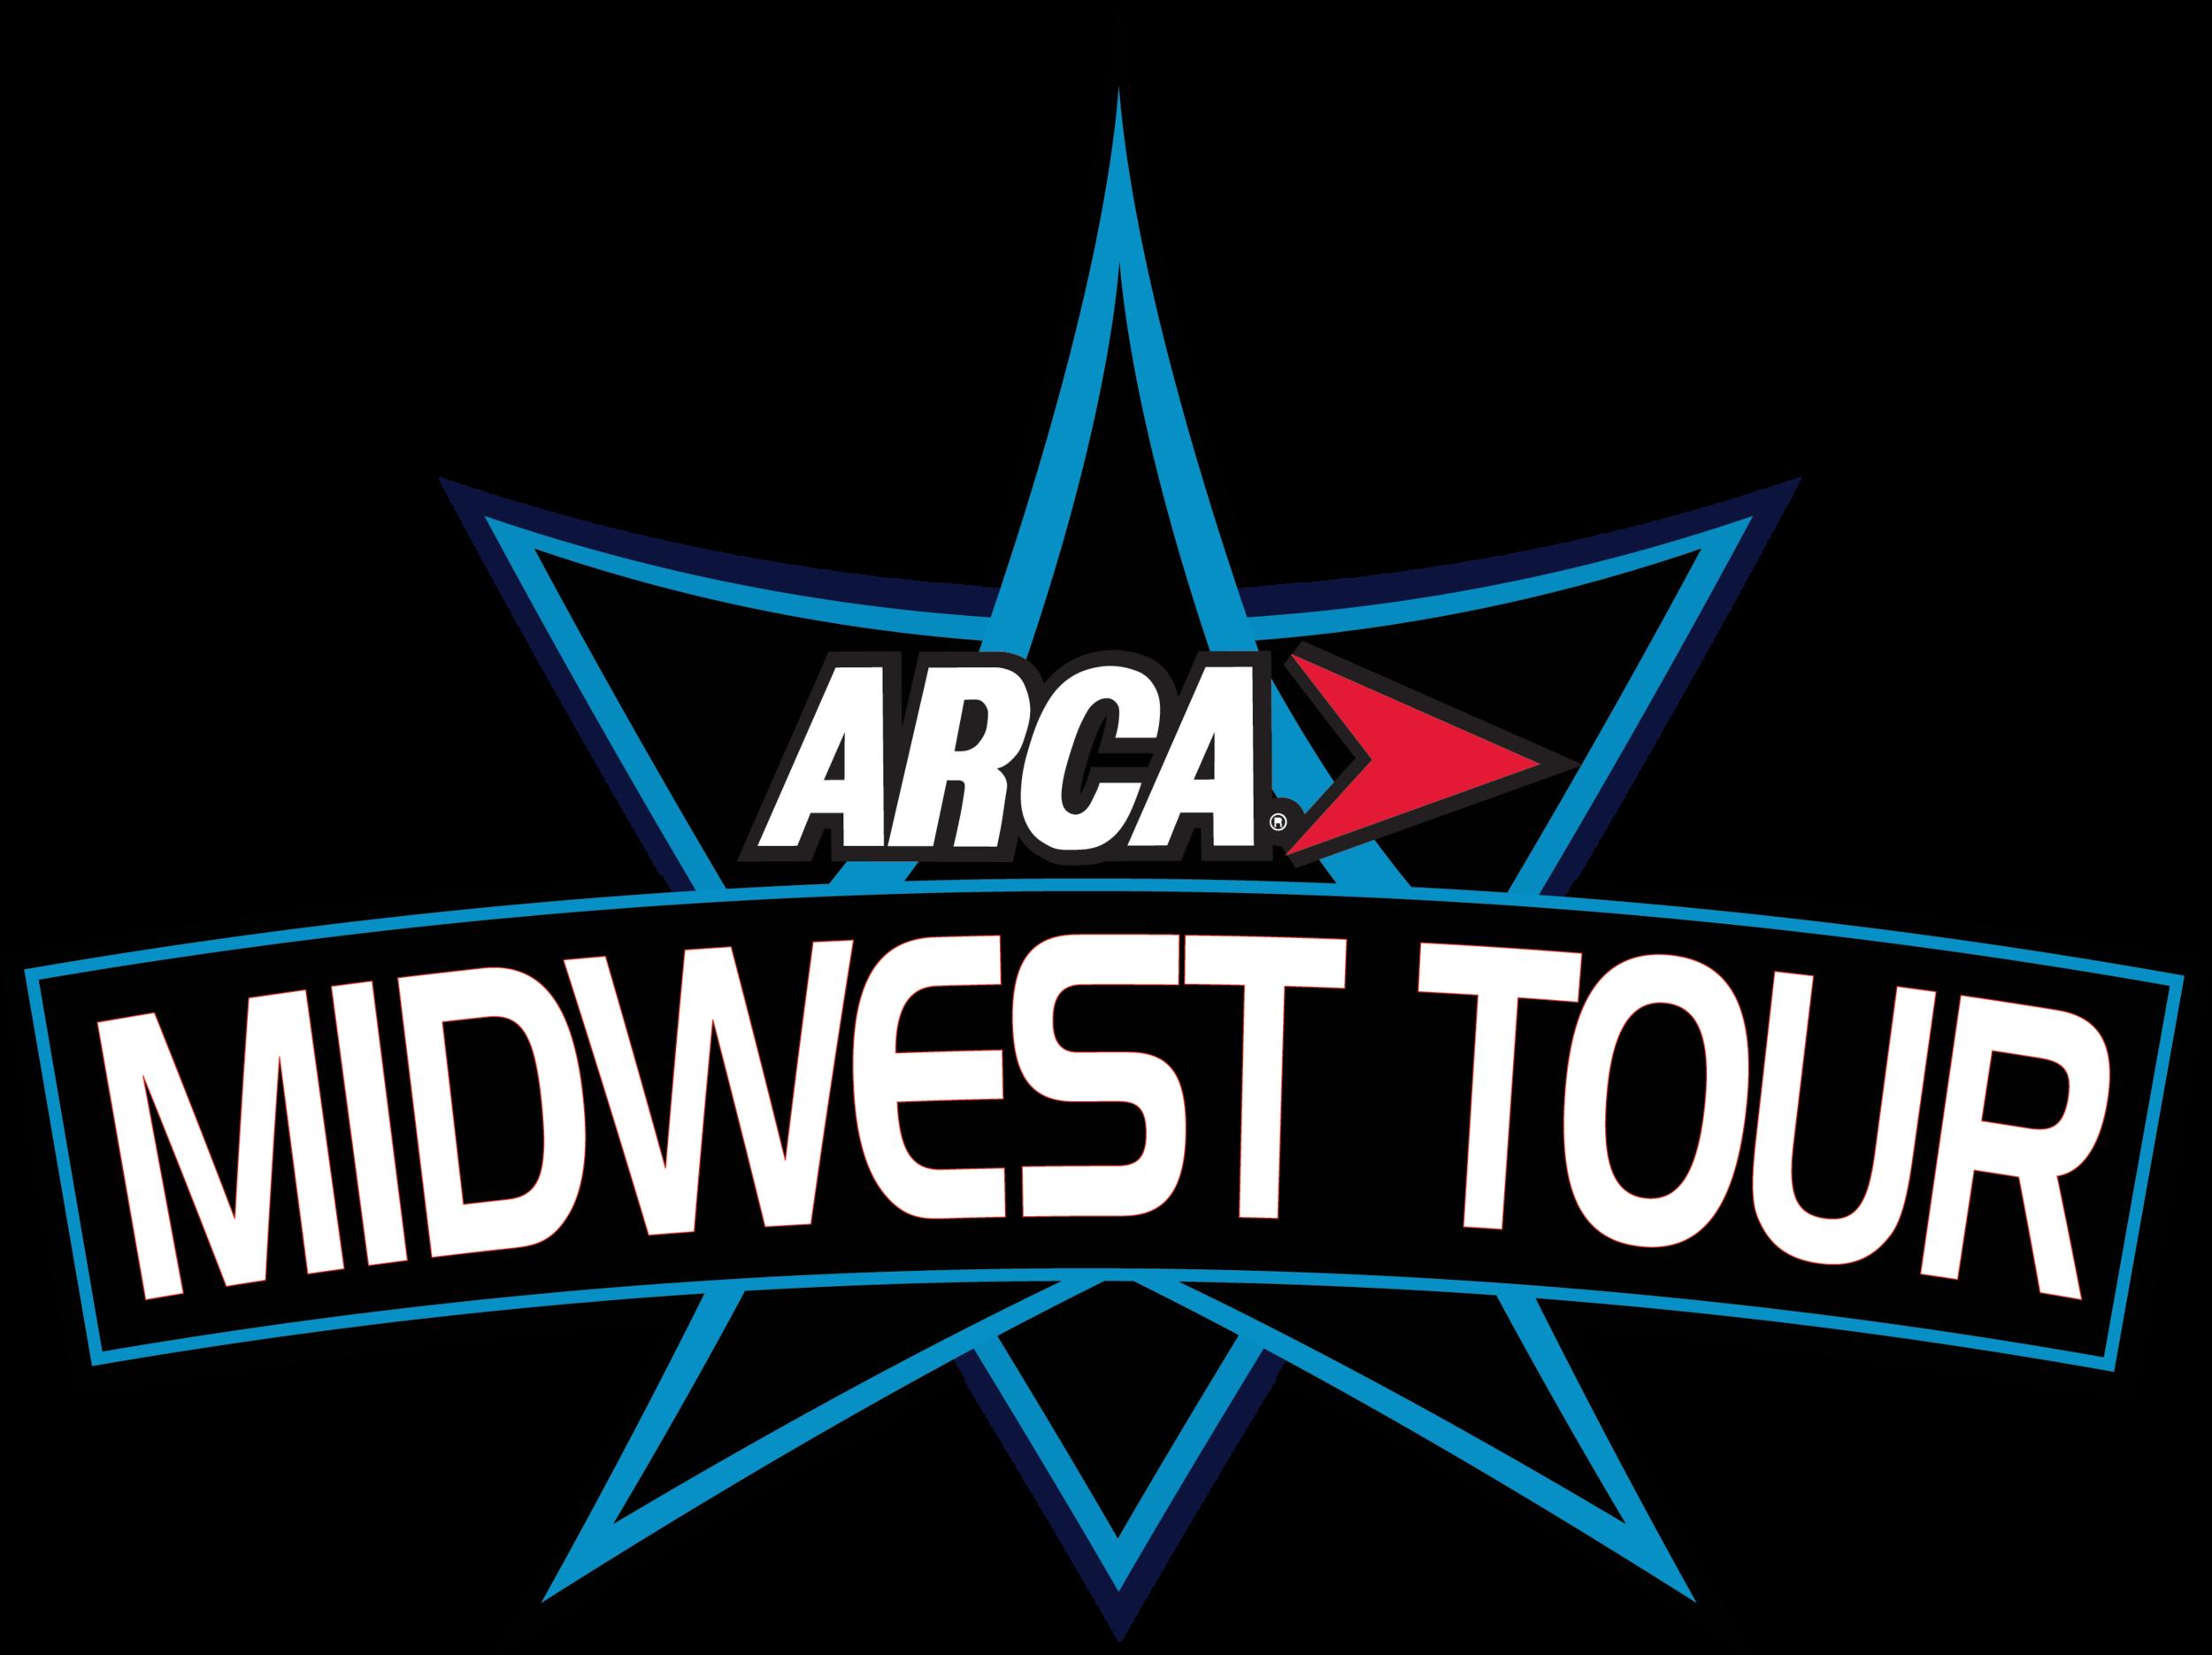 ARCA-Midwest-Tour-logo_01.png